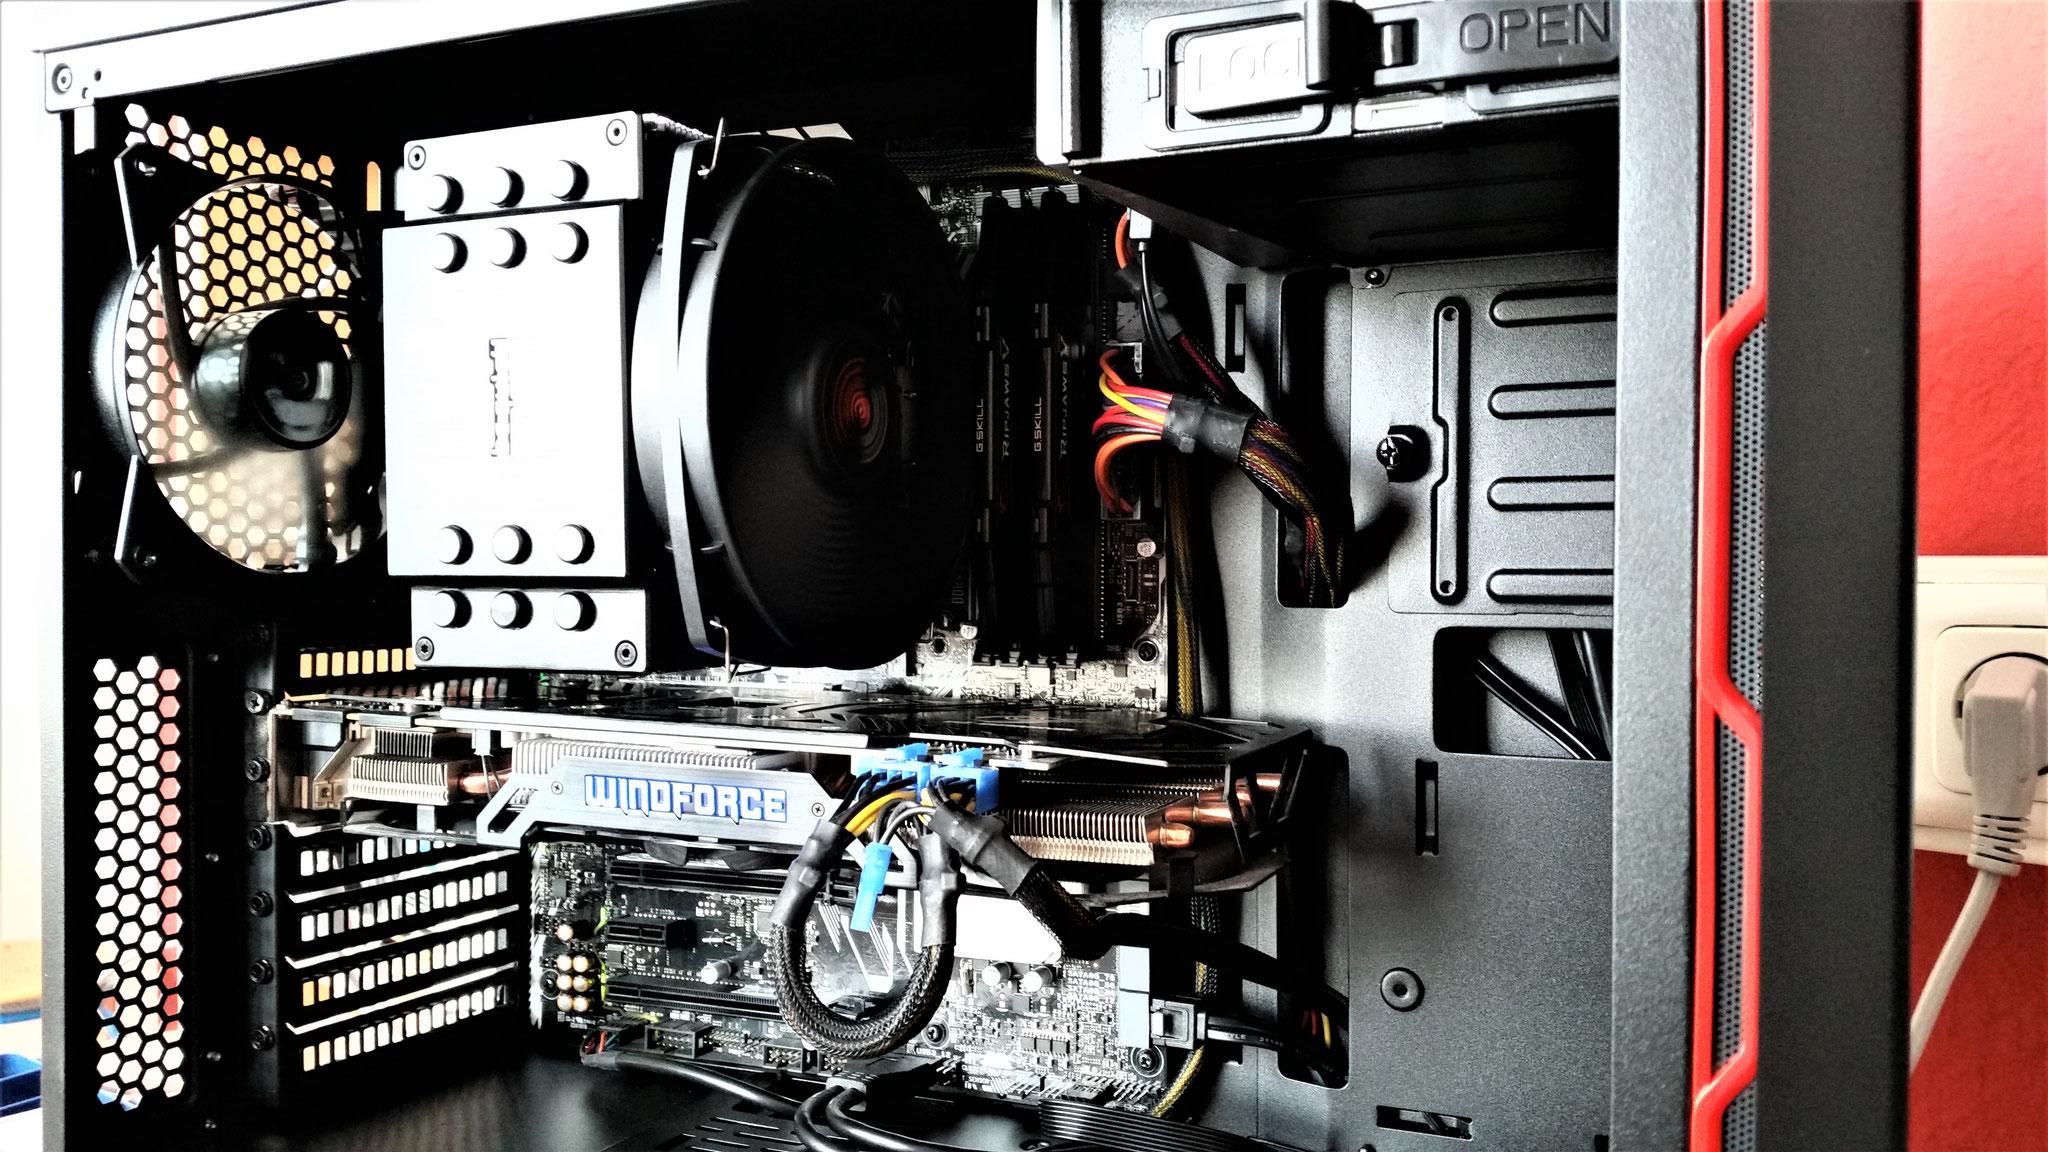 PC-Upgrade: aus Alt wird Neu. CPU, RAM, Grafikkarte oder Mainboard etc.